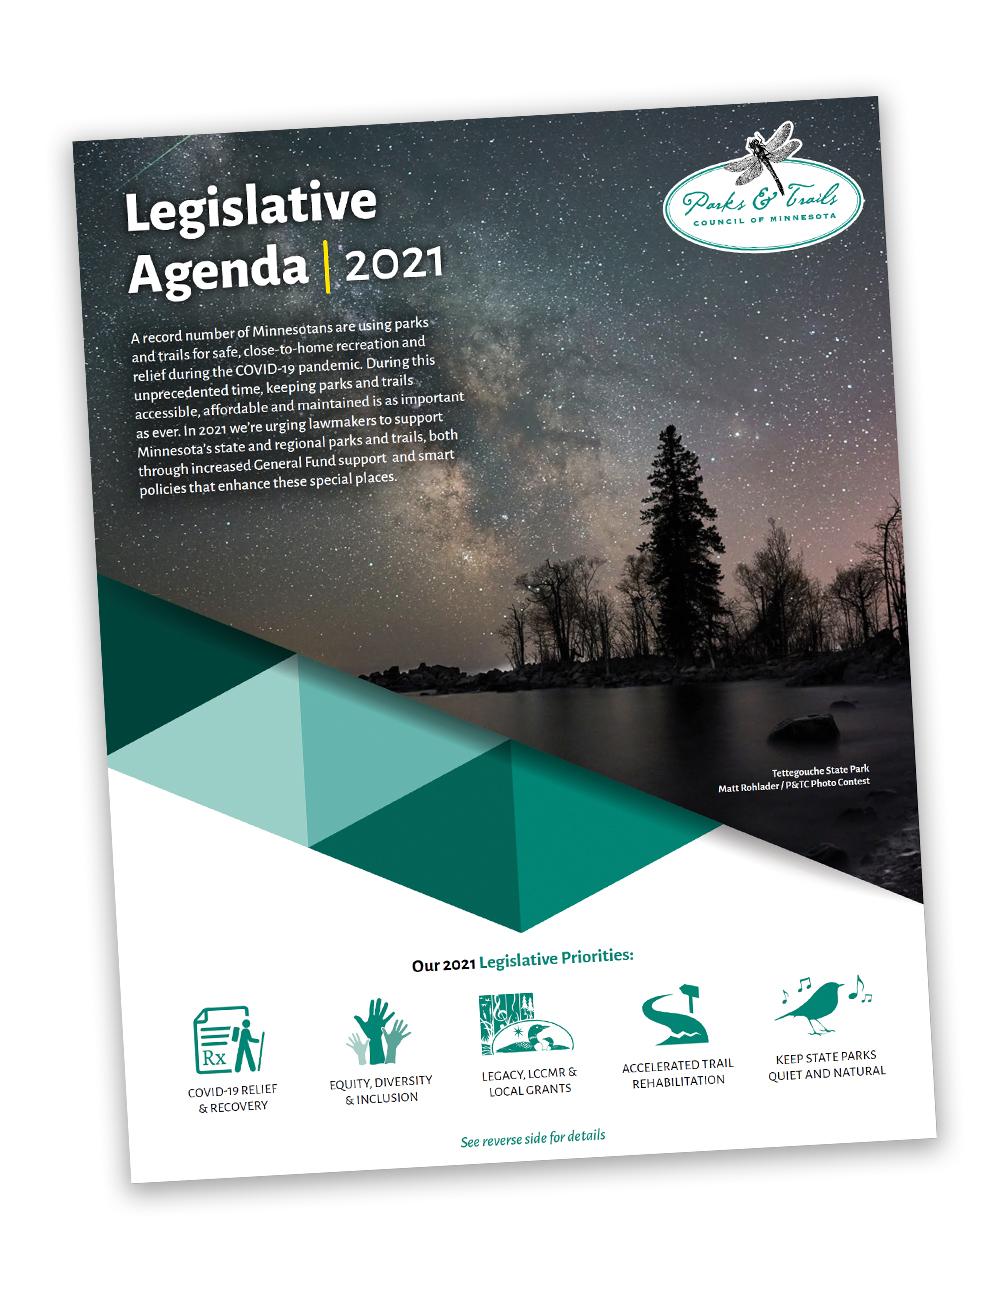 2021 Legislative Agenda cover